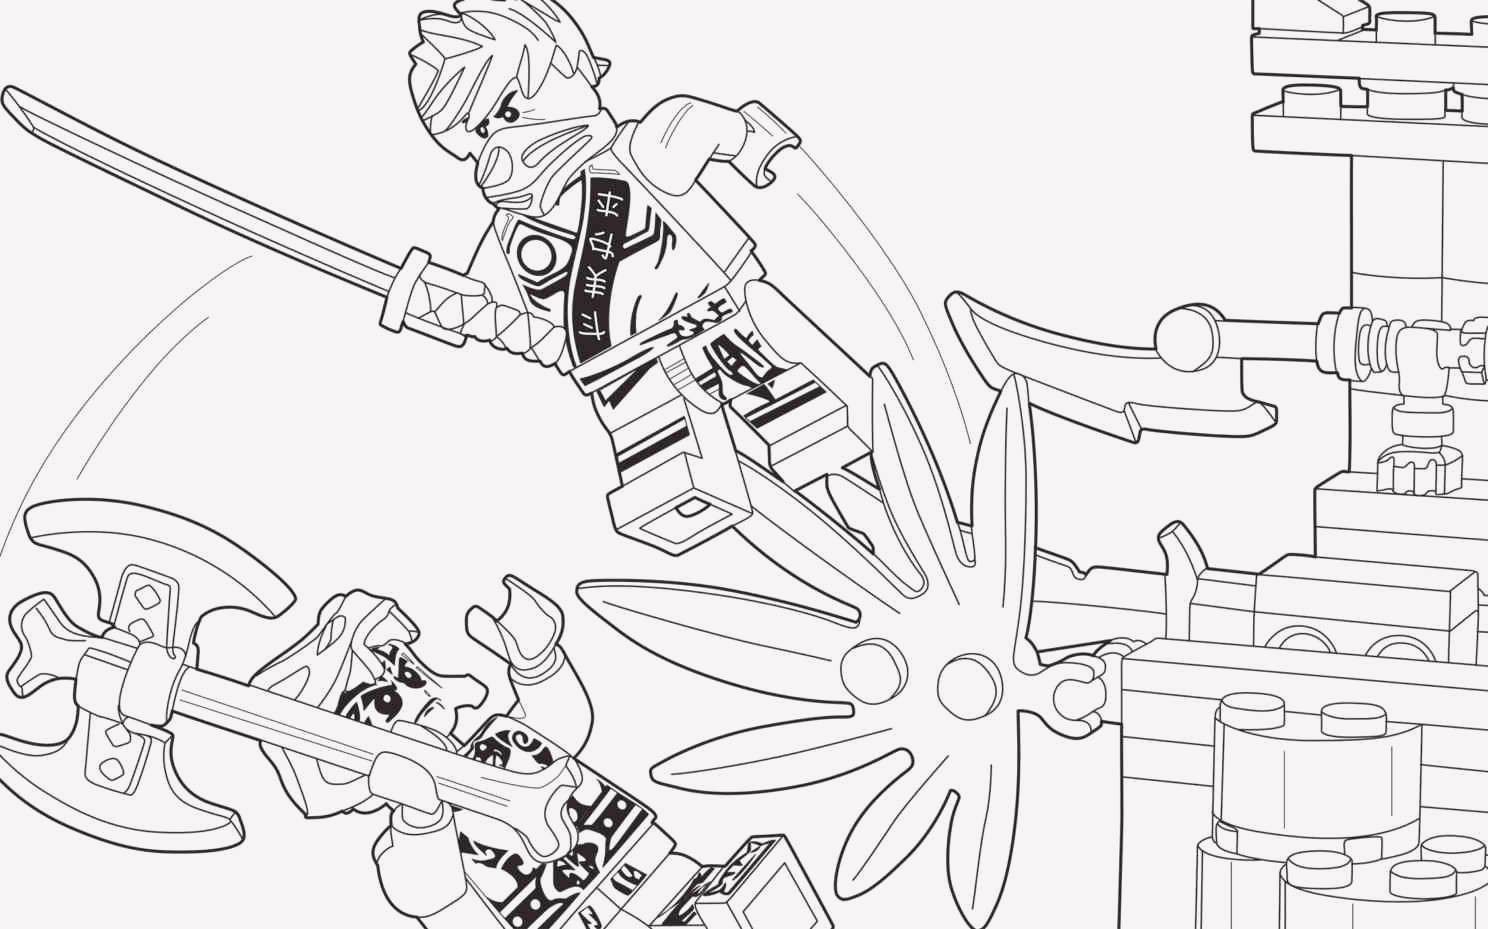 Ausmalbilder Kostenlos Ninjago Neu 35 Coole Drachen Ausmalbilder Scoredatscore Best Ausmalbilder Von Das Bild